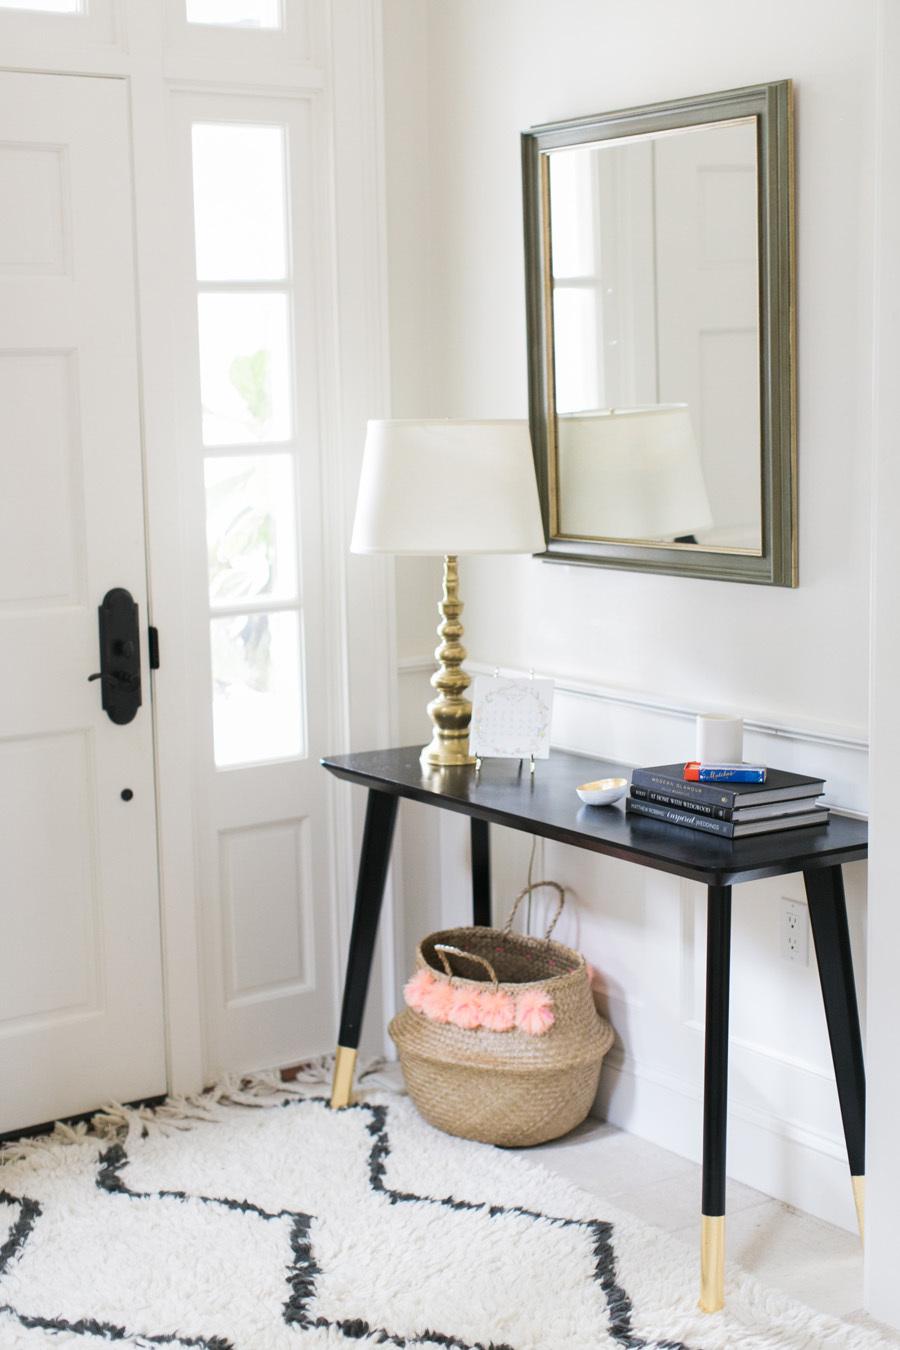 DIY Ikea Hack Entry Table and Pom Pom Basket